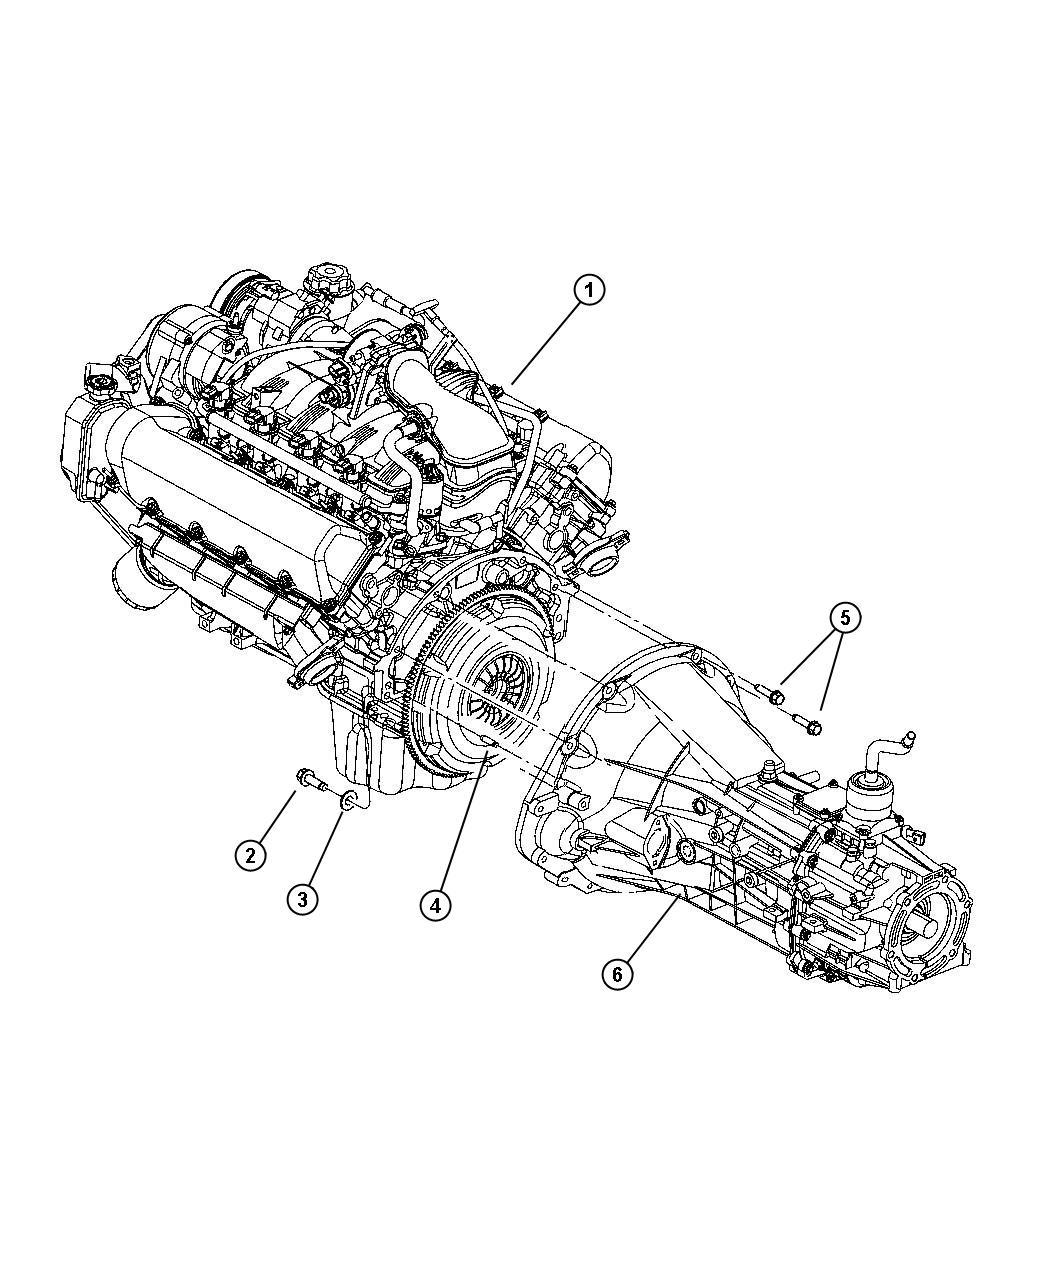 Dodge Dakota Transmission 6 Speed